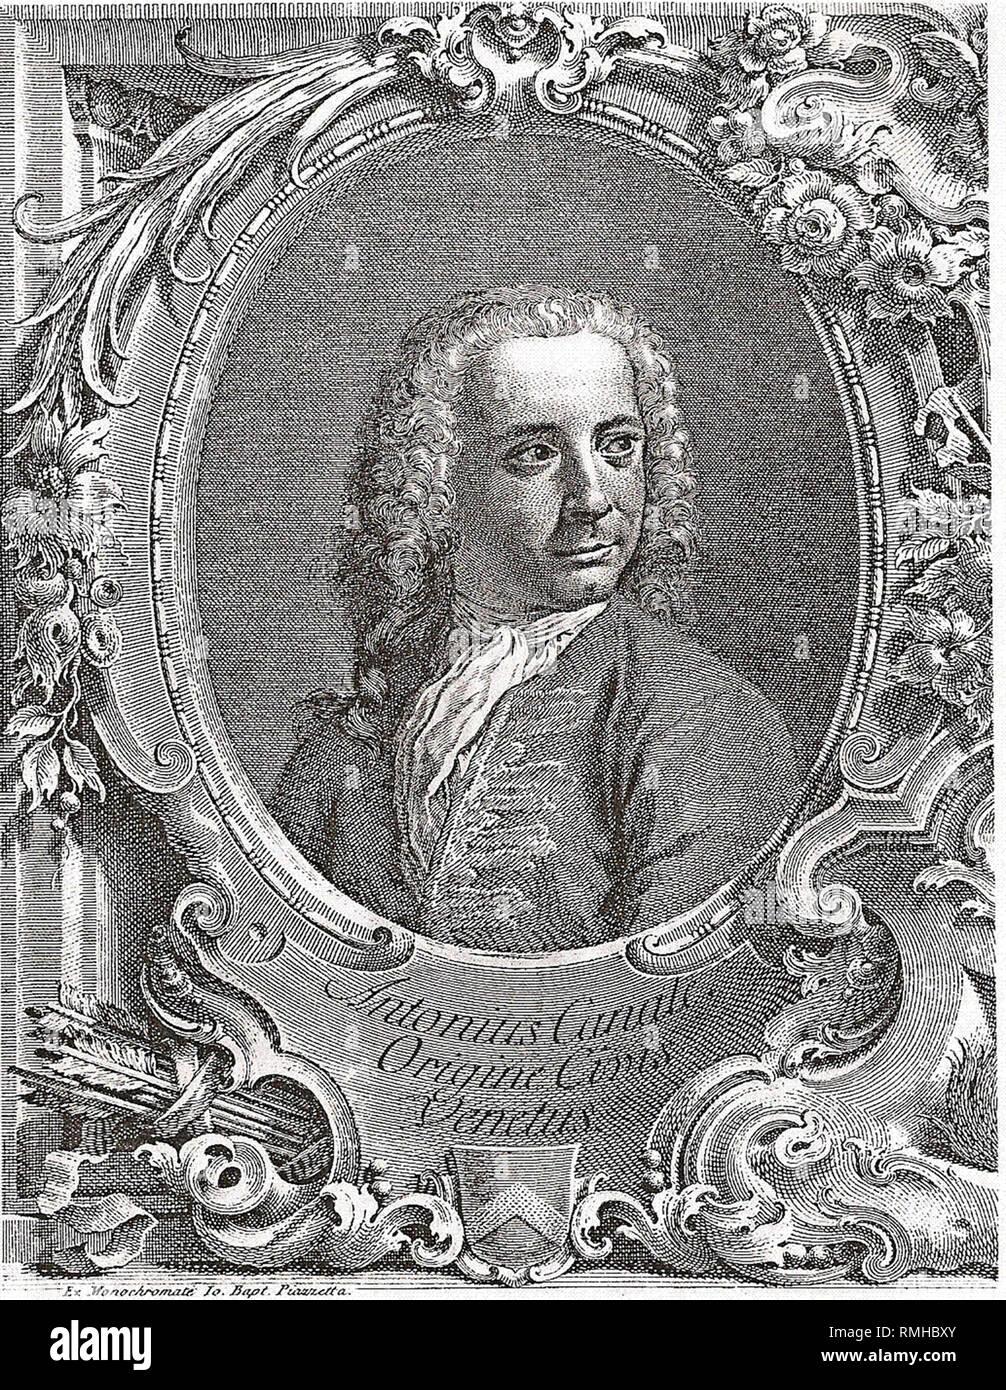 Canaletto, Giovanni Antonio Canal (1697 – 1768), Canaletto, Italian painter artist - Stock Image